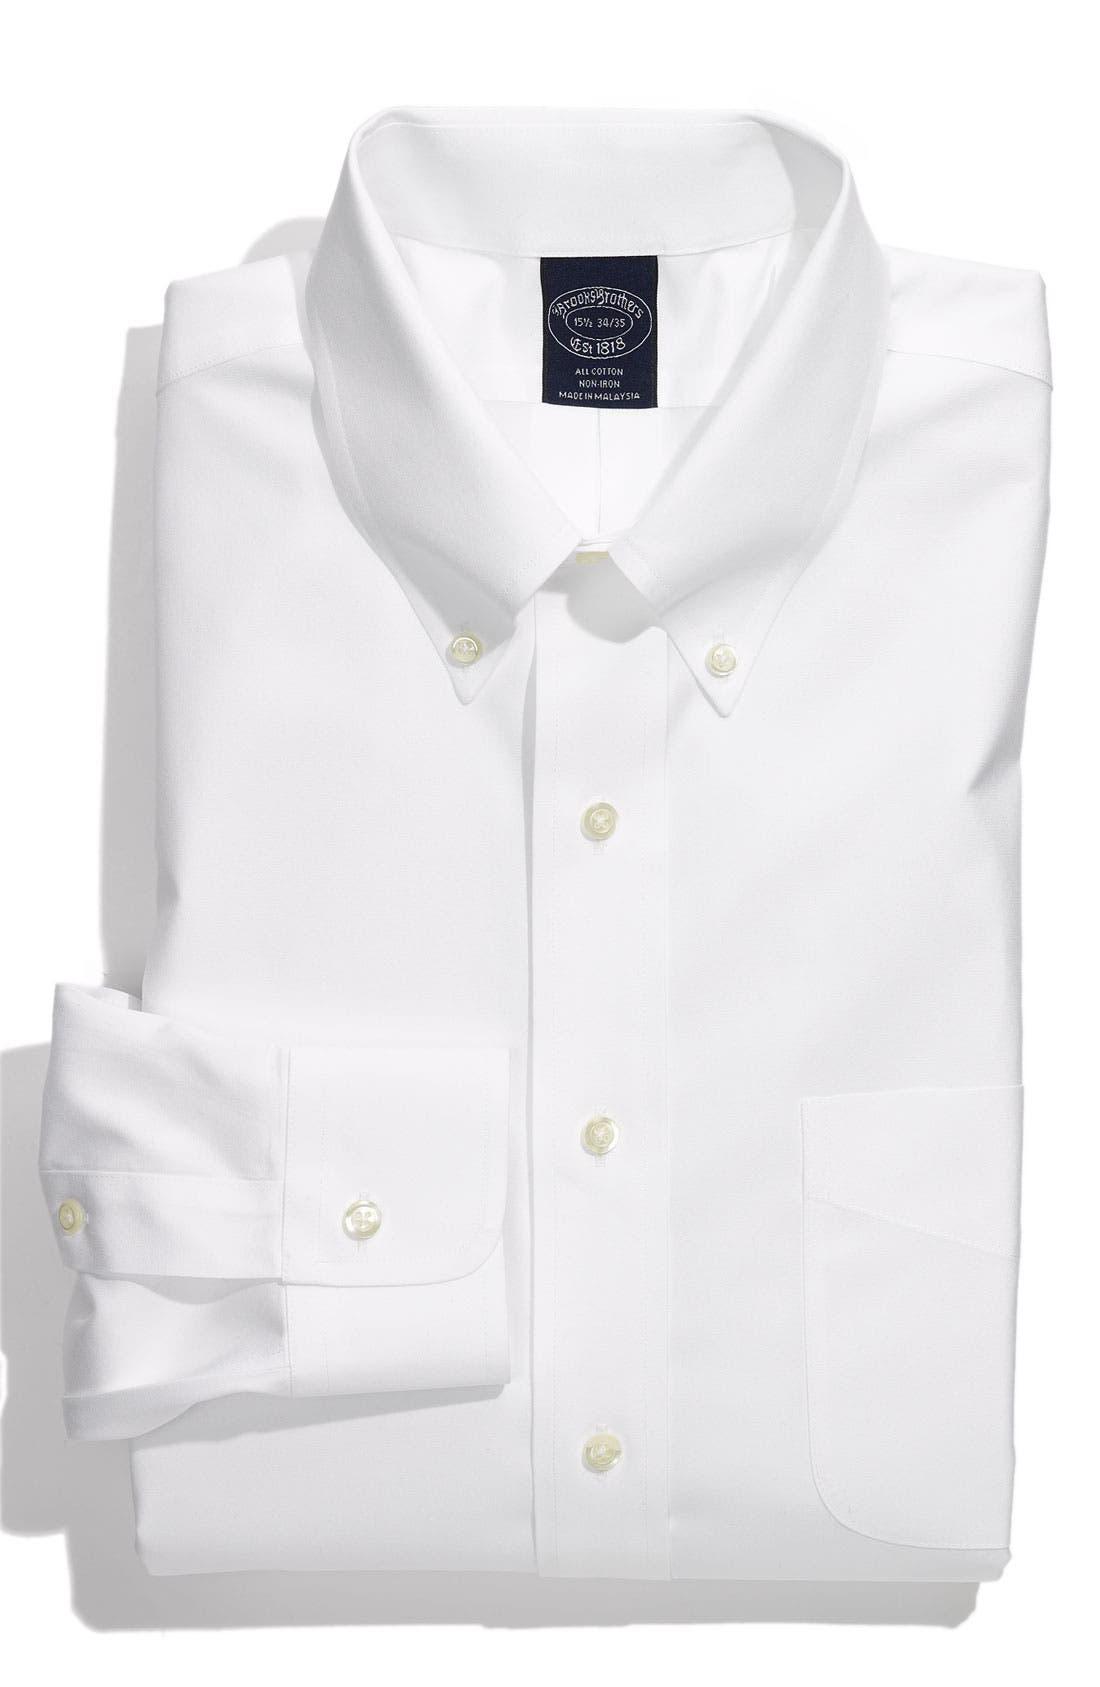 Alternate Image 1 Selected - Brooks Brothers Non-Iron Dress Shirt